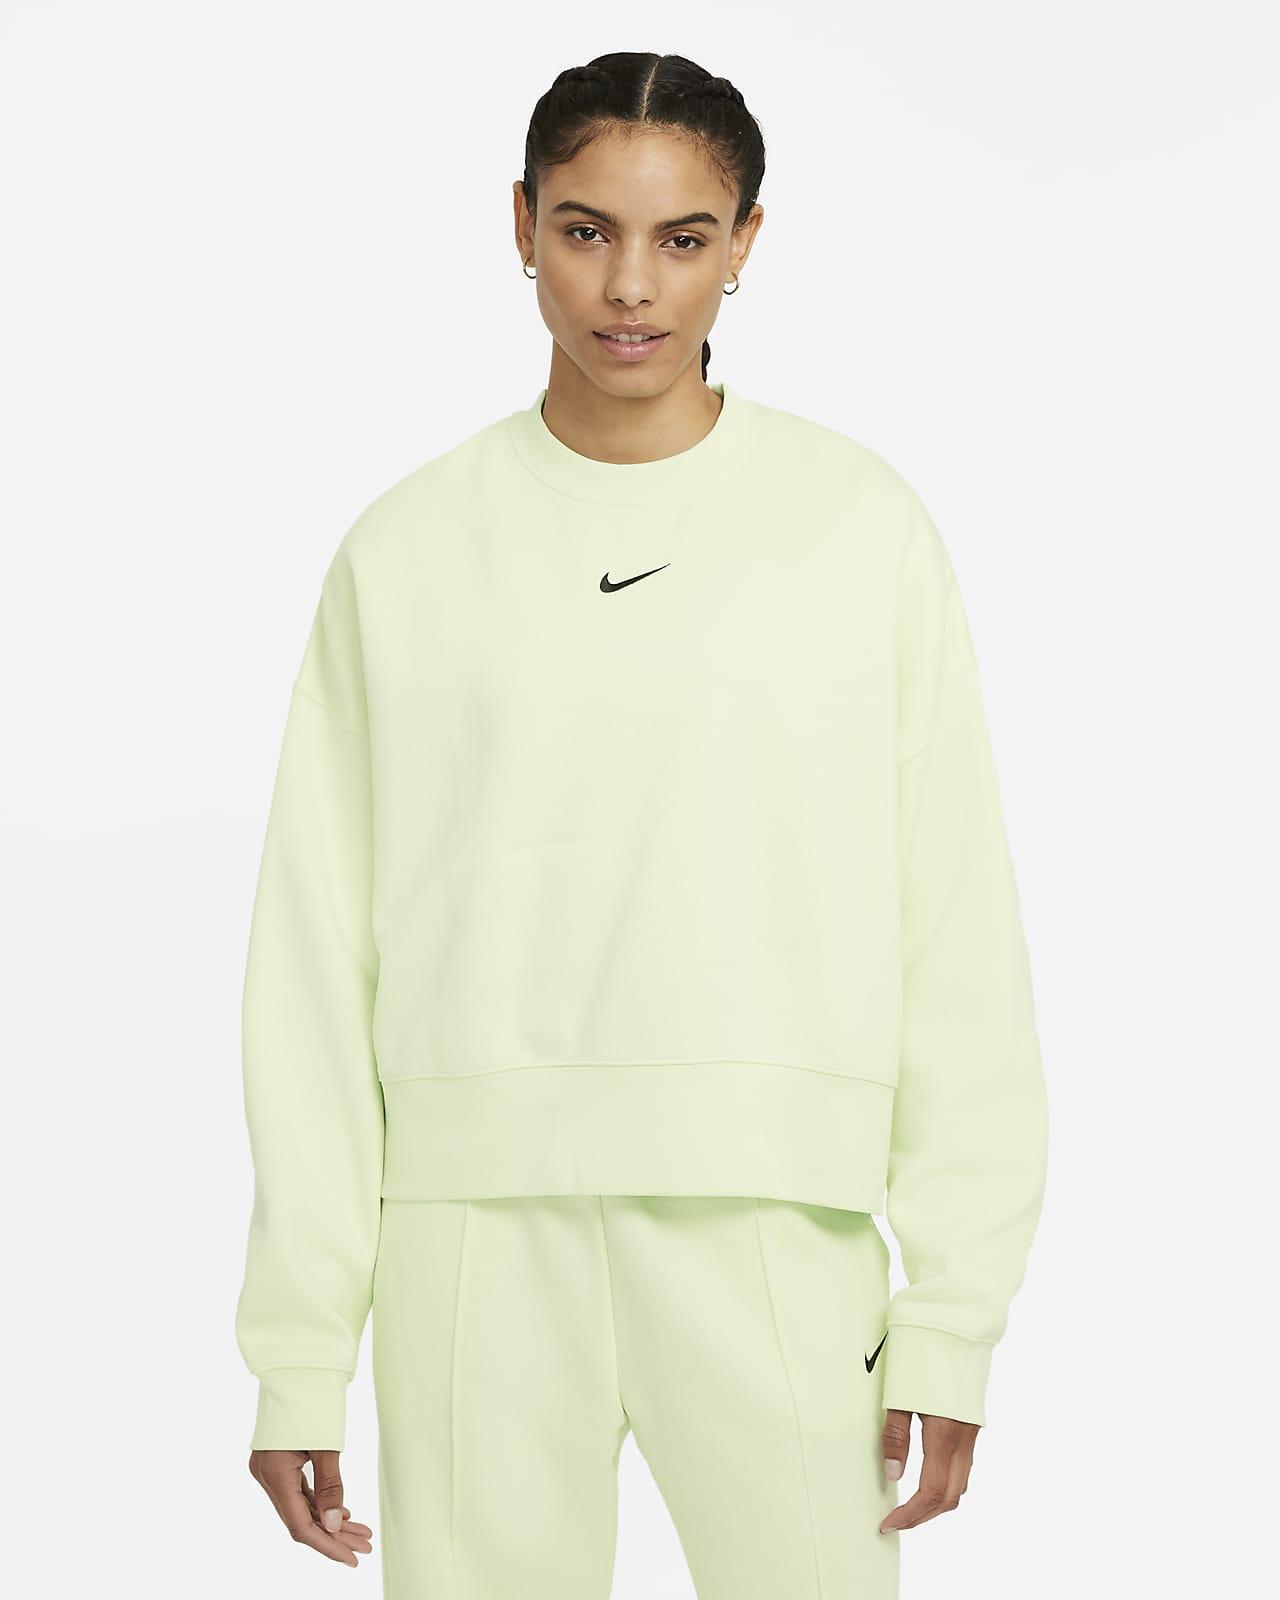 Nike Sportswear Collection Essentials Women's Oversized Fleece Crew